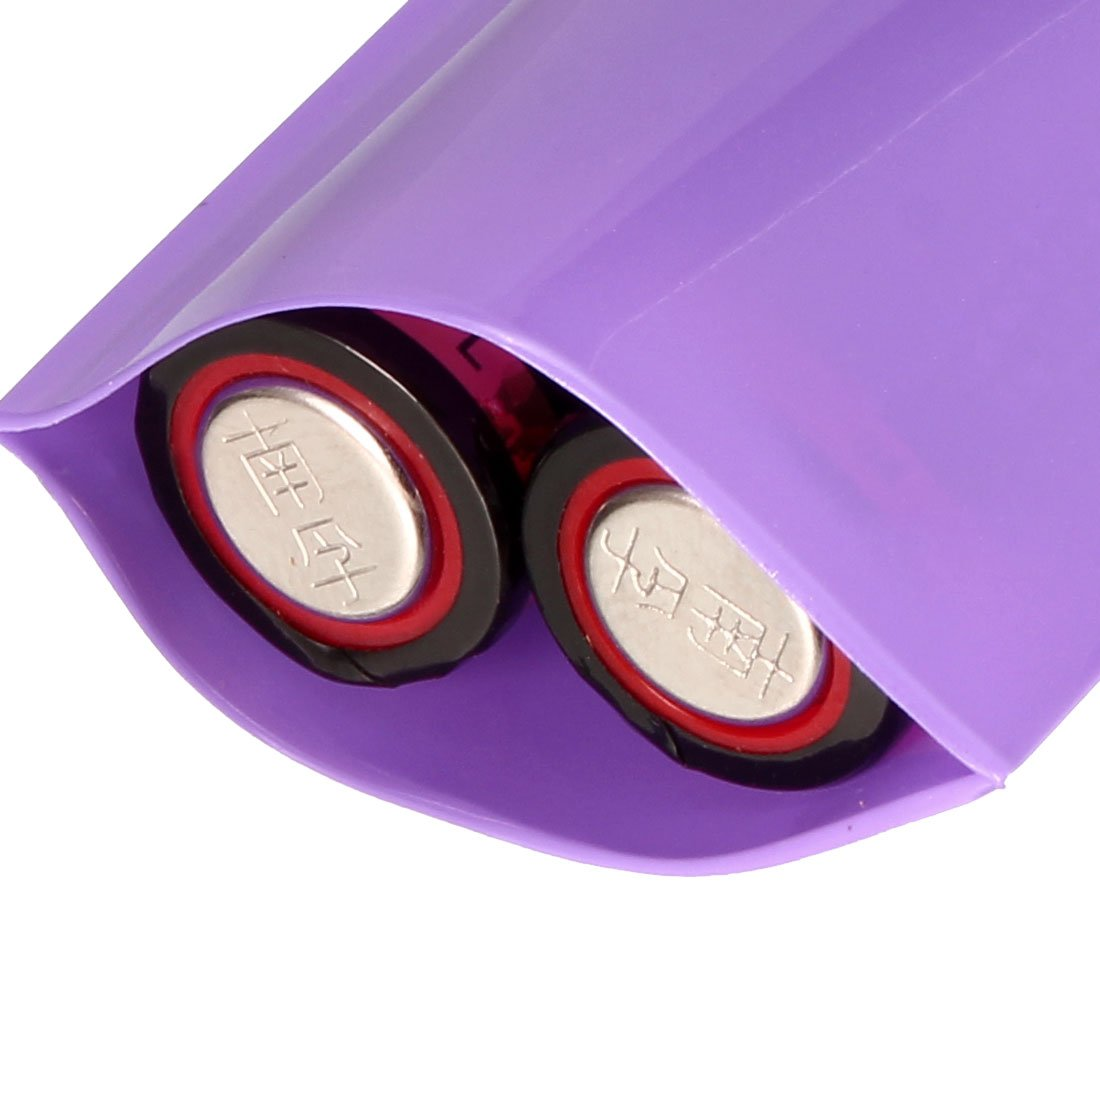 sourcingmap PVC Heat Shrink Tubing Tube 43mm for 26650 Shrink Film 2M Black